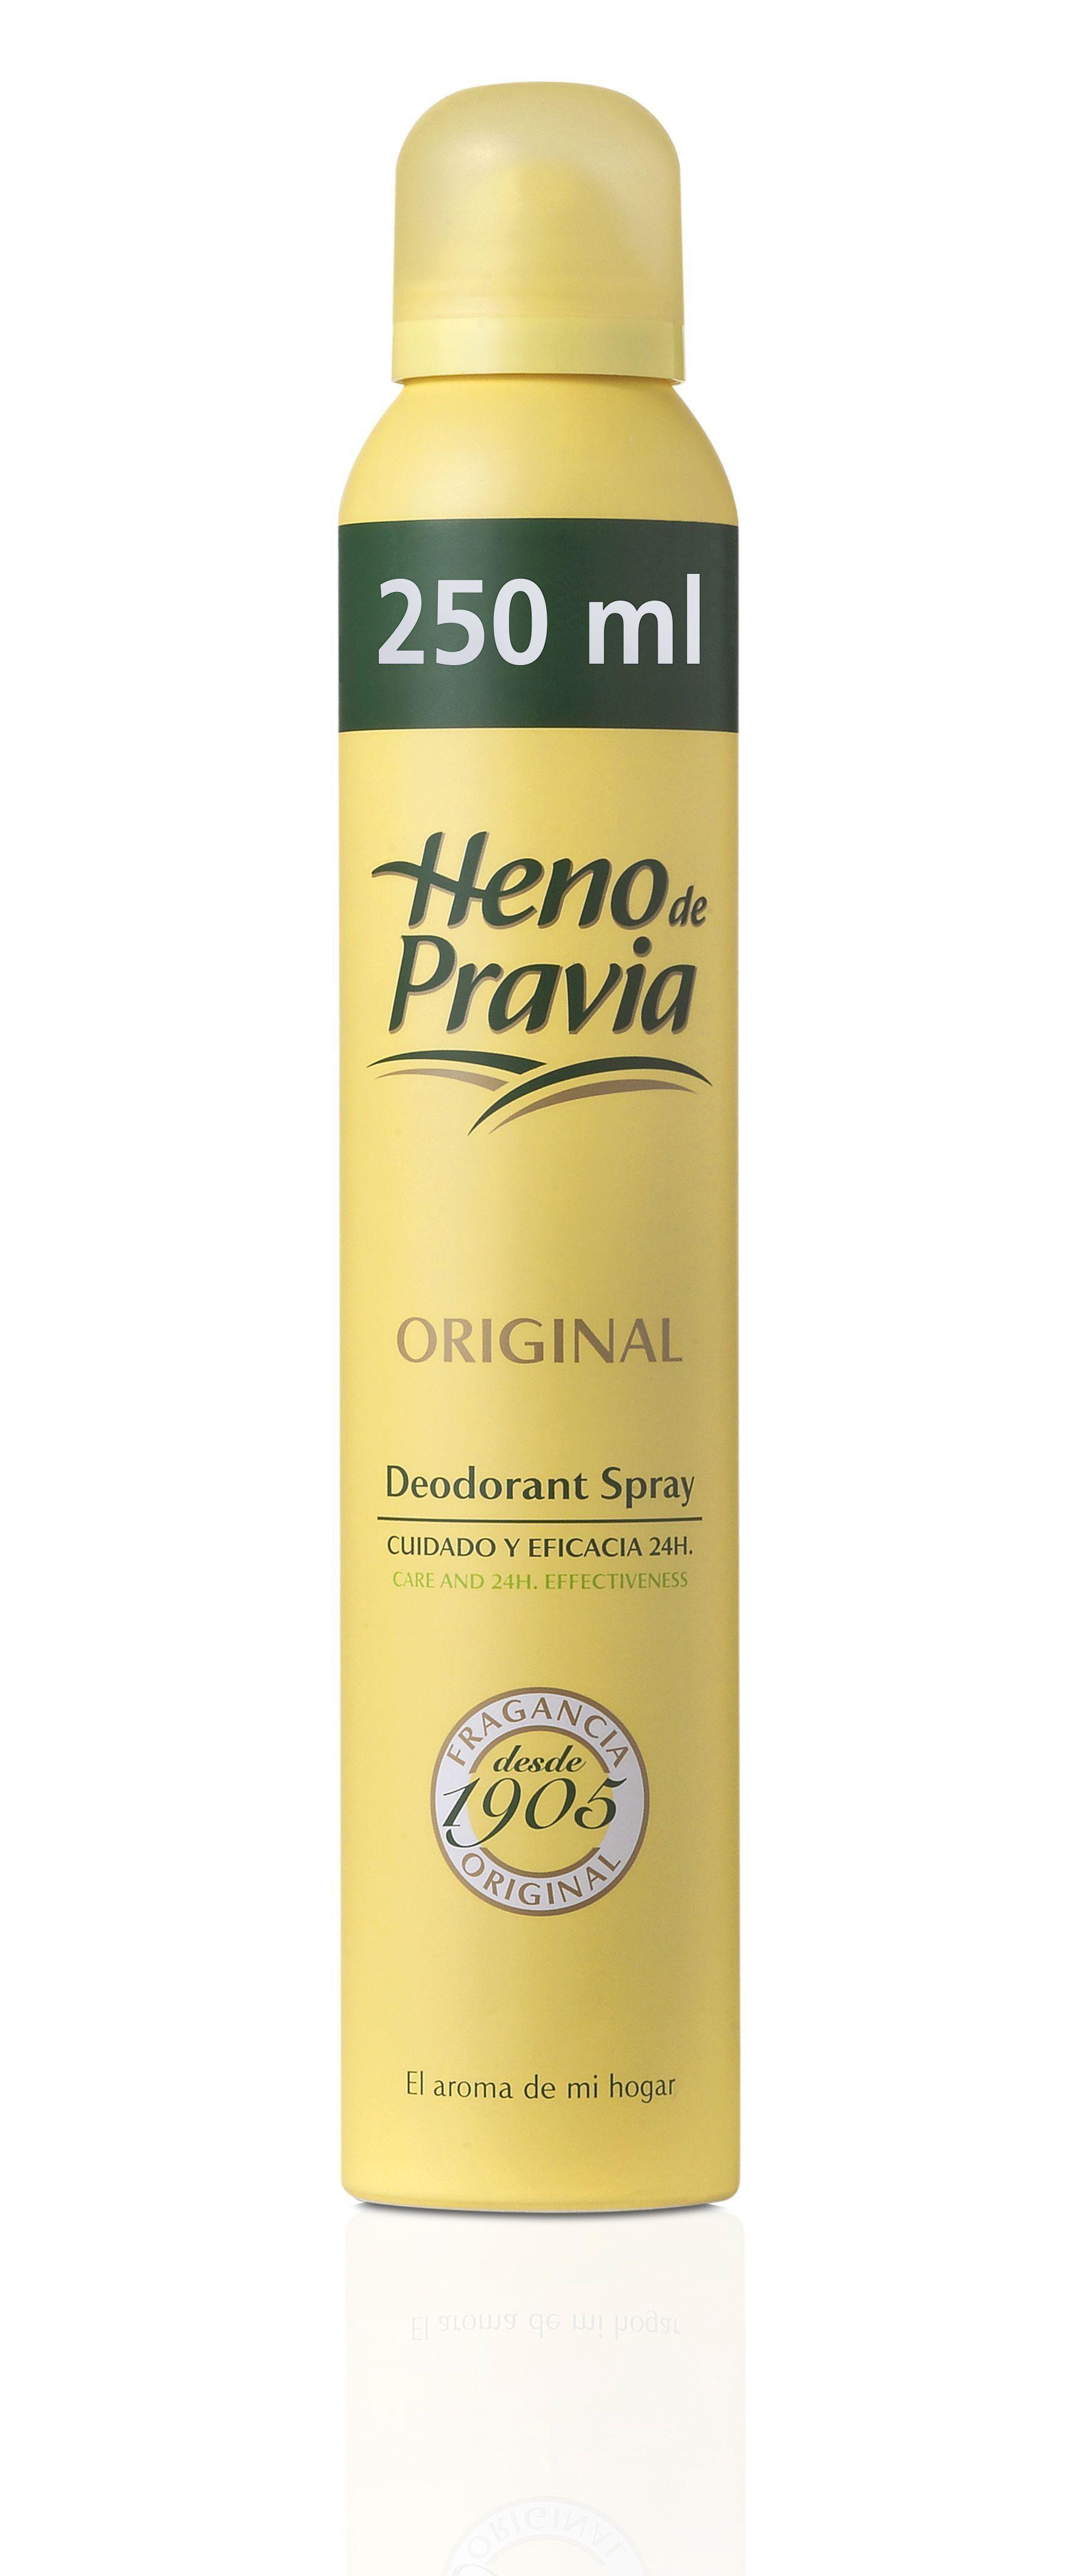 Heno Pravia Desodorante Spray Original 250ml